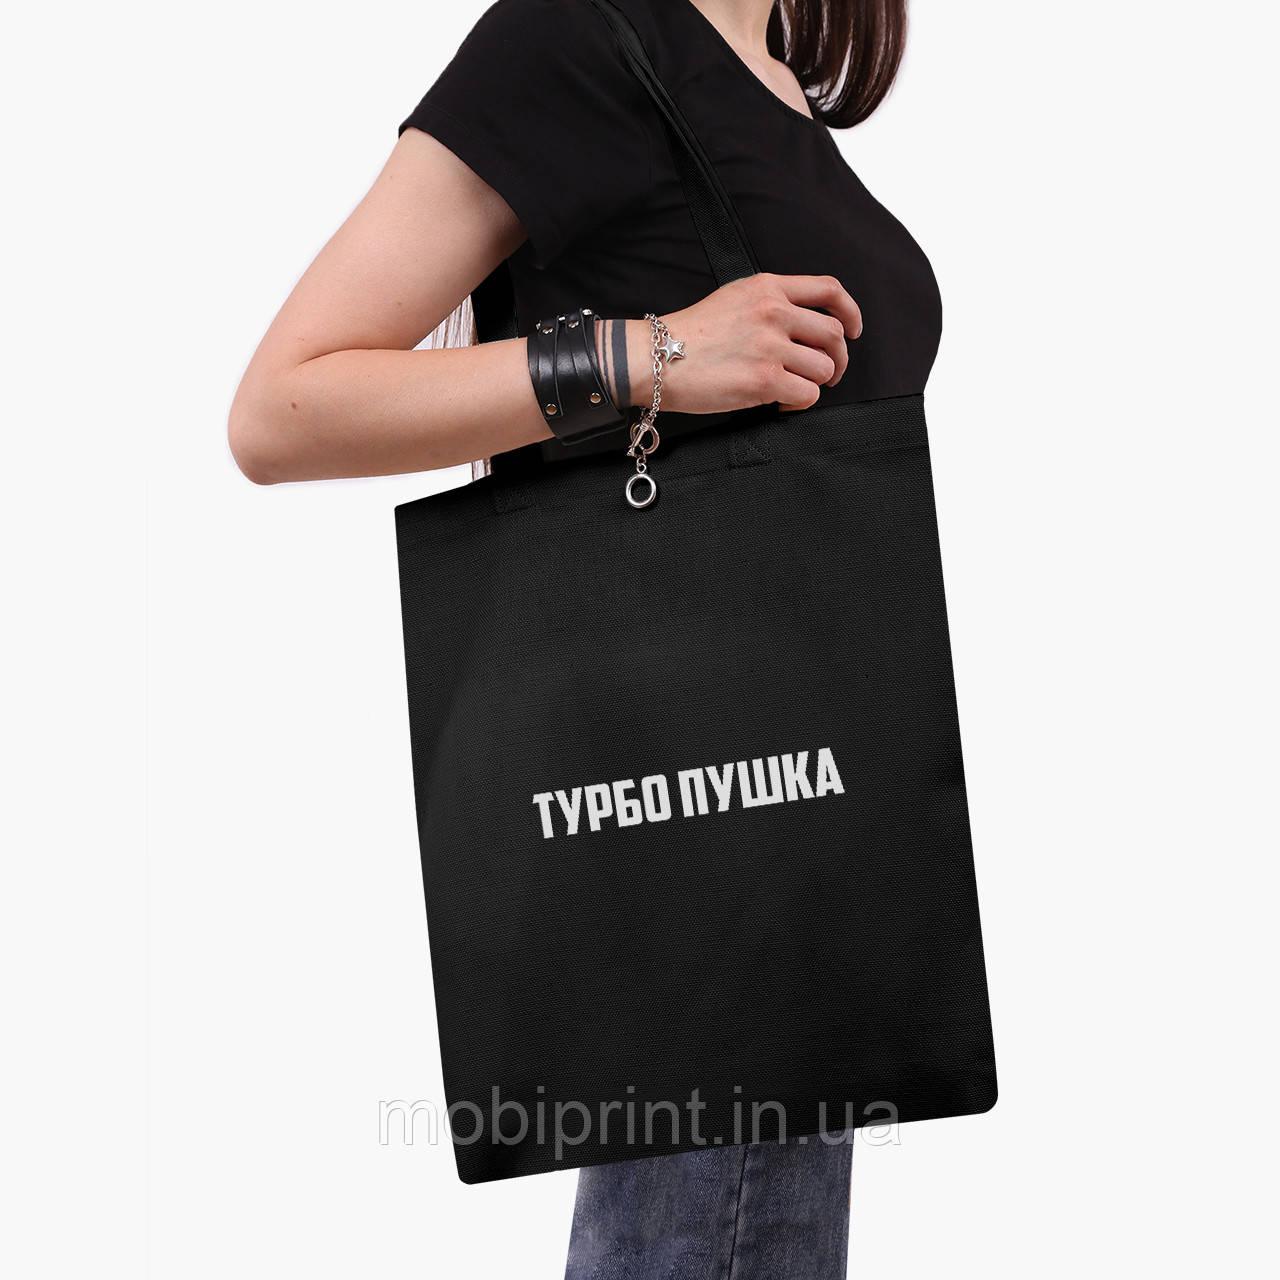 Эко сумка шоппер черная Турбо пушка (Turbo cannon) (9227-1291-2)  41*35 см